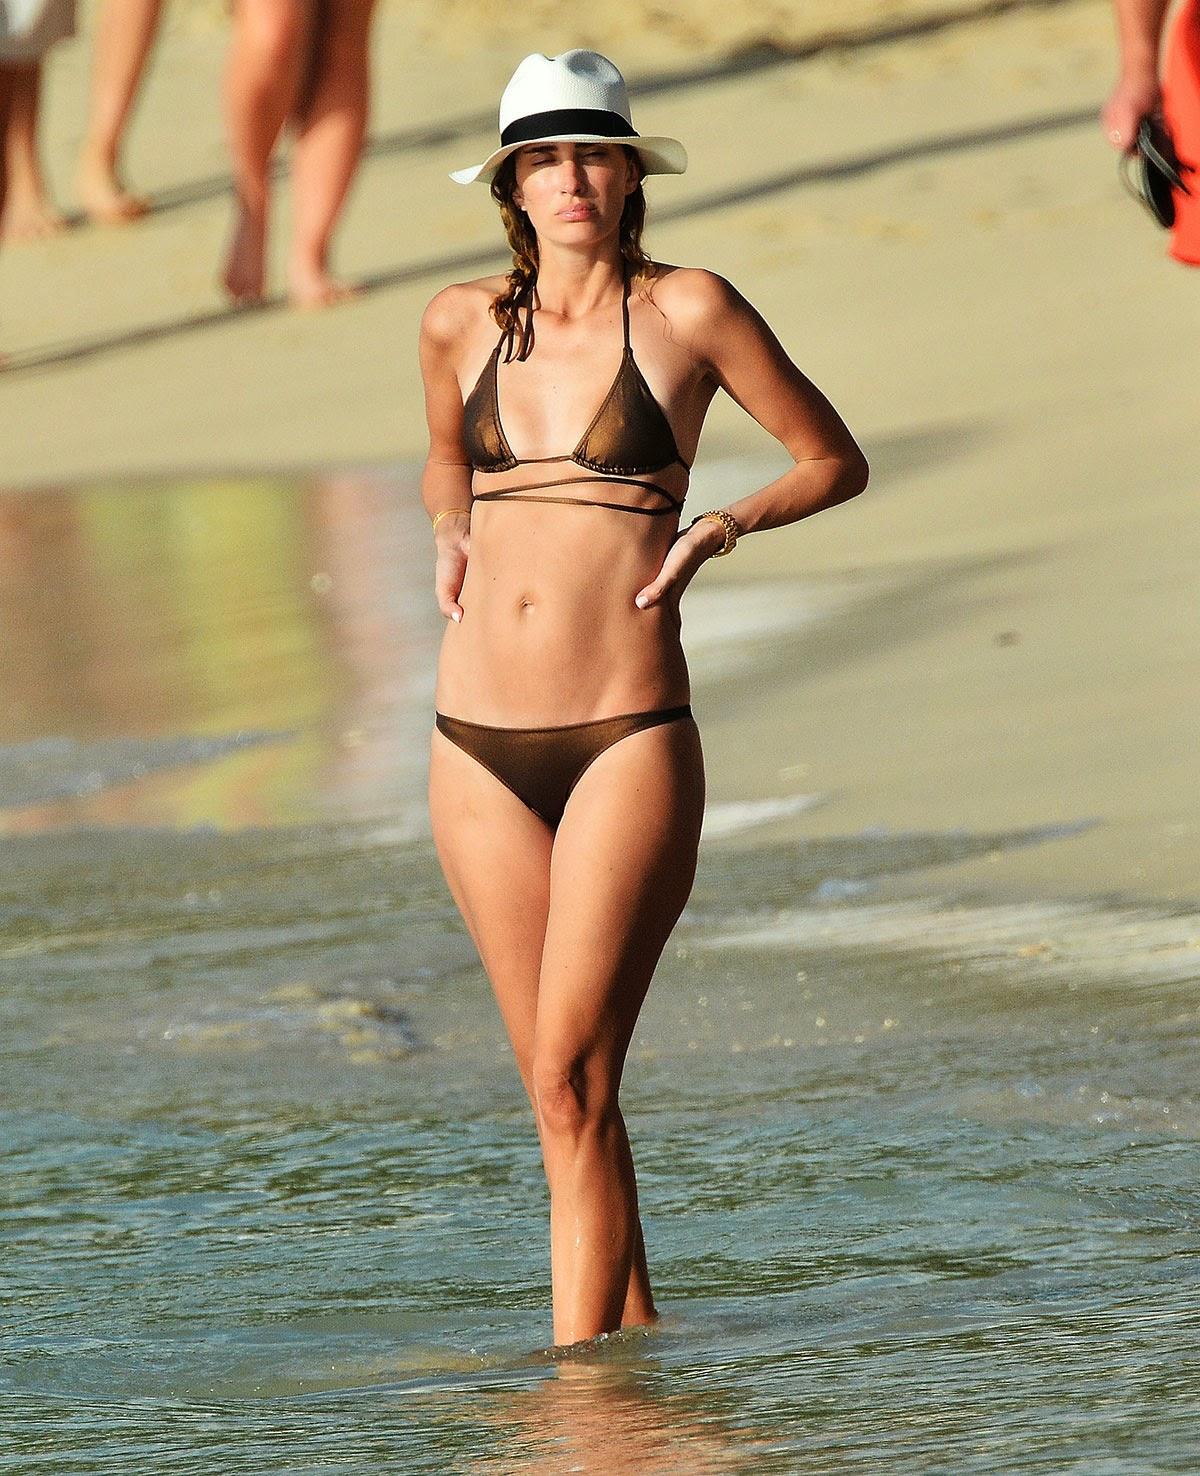 rhea+durham+bikini+boob+flash +candid+photos+in+barbados+www.gutteruncensoredplus+012